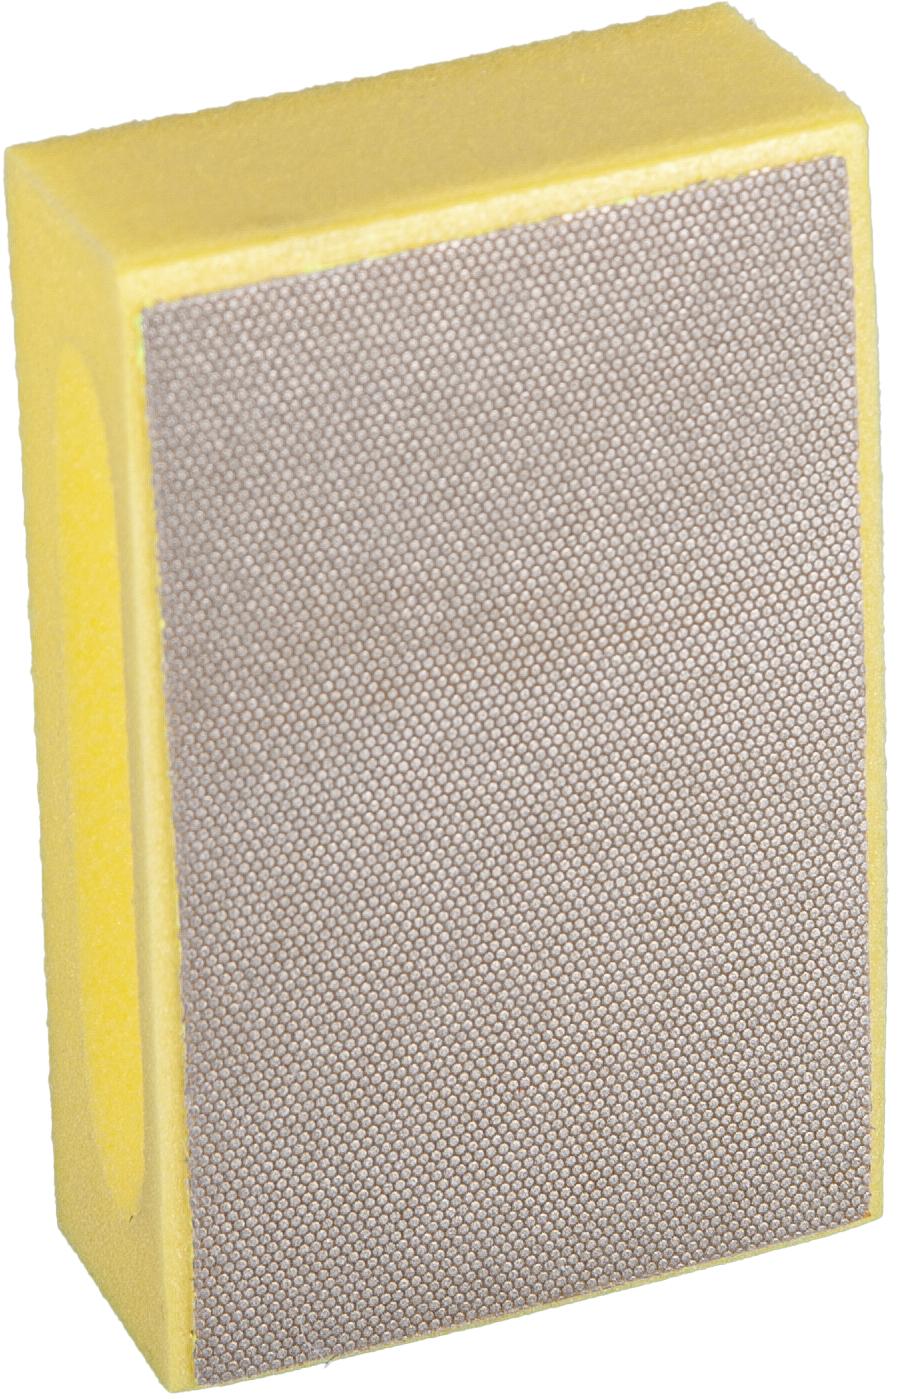 Diamant Handpad 90 x 55 mm │ Korn 400